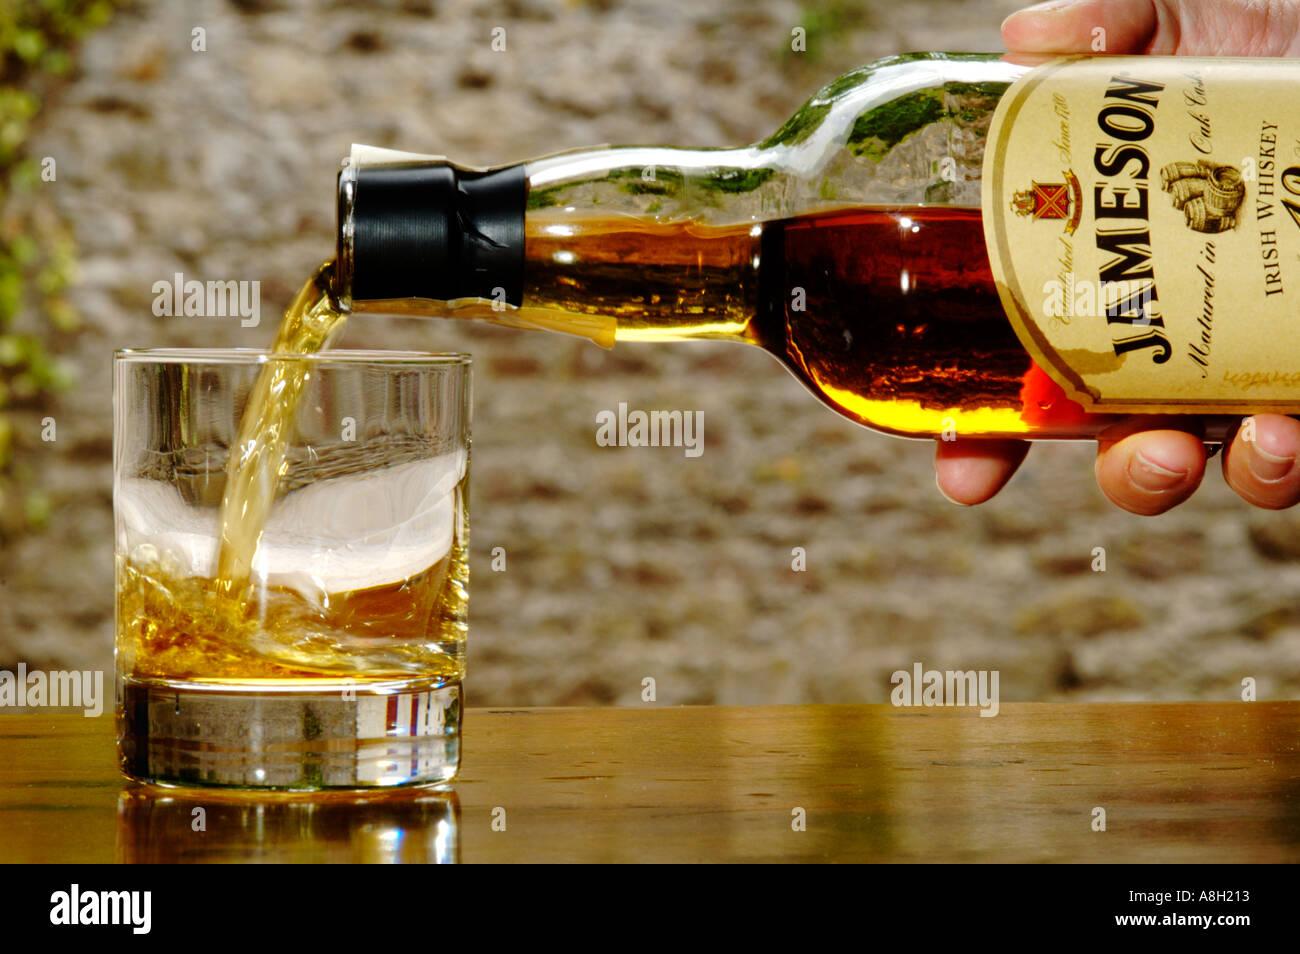 Ireland, County Cork, Old Midleton Distillery, Jameson whiskey Stock Photo